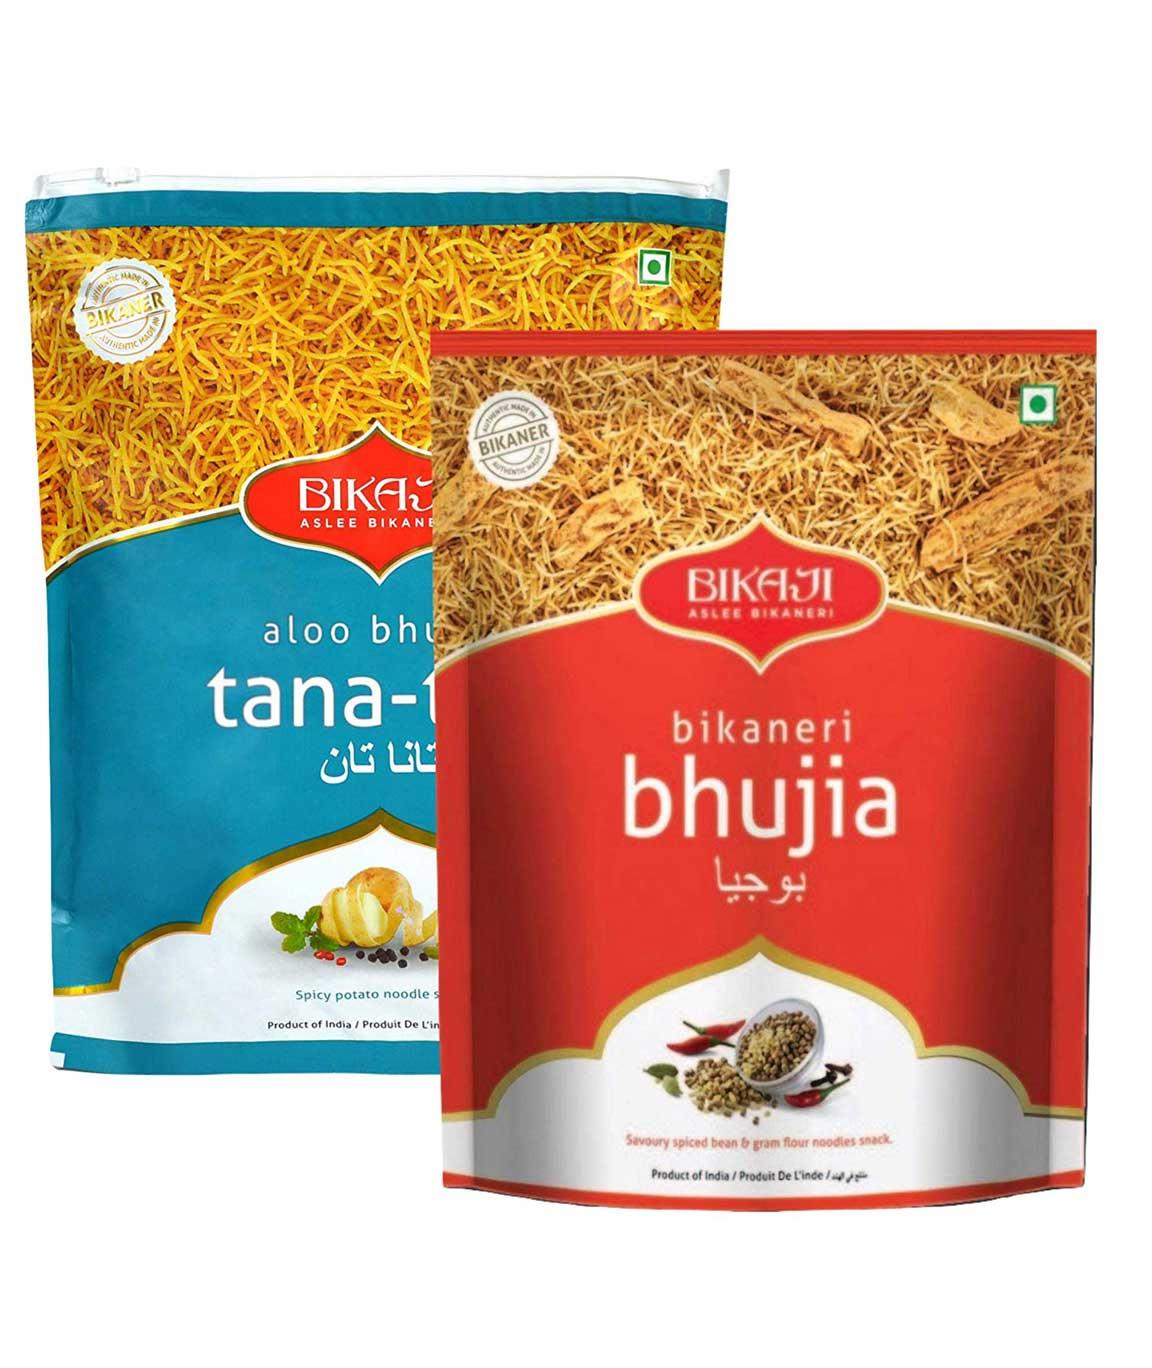 Bikaji Combo Pack - Bikaji bhujiya 400gm - Aloo Bhujia Tana-Tan 400gm - Indian Namkeen Snacks - (Pack of 2)